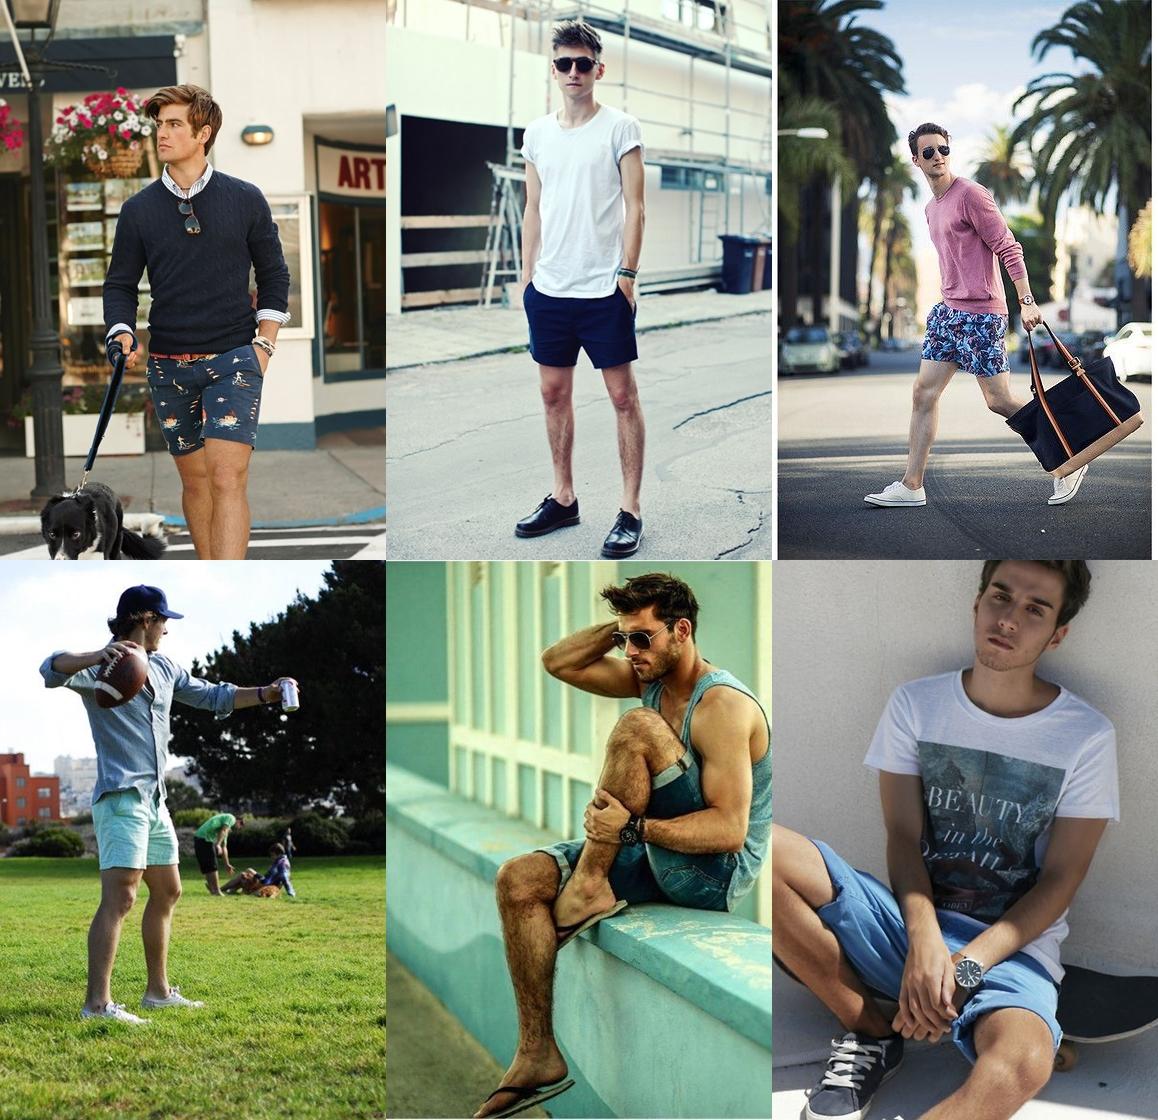 como usar short masculino, short masculino 2016, verão 2016, tendencia masculina, moda masculina, dicas de moda, dicas de estilo, alex cursino, moda sem censura, menswear, blogger, blogueiro de moda, 3